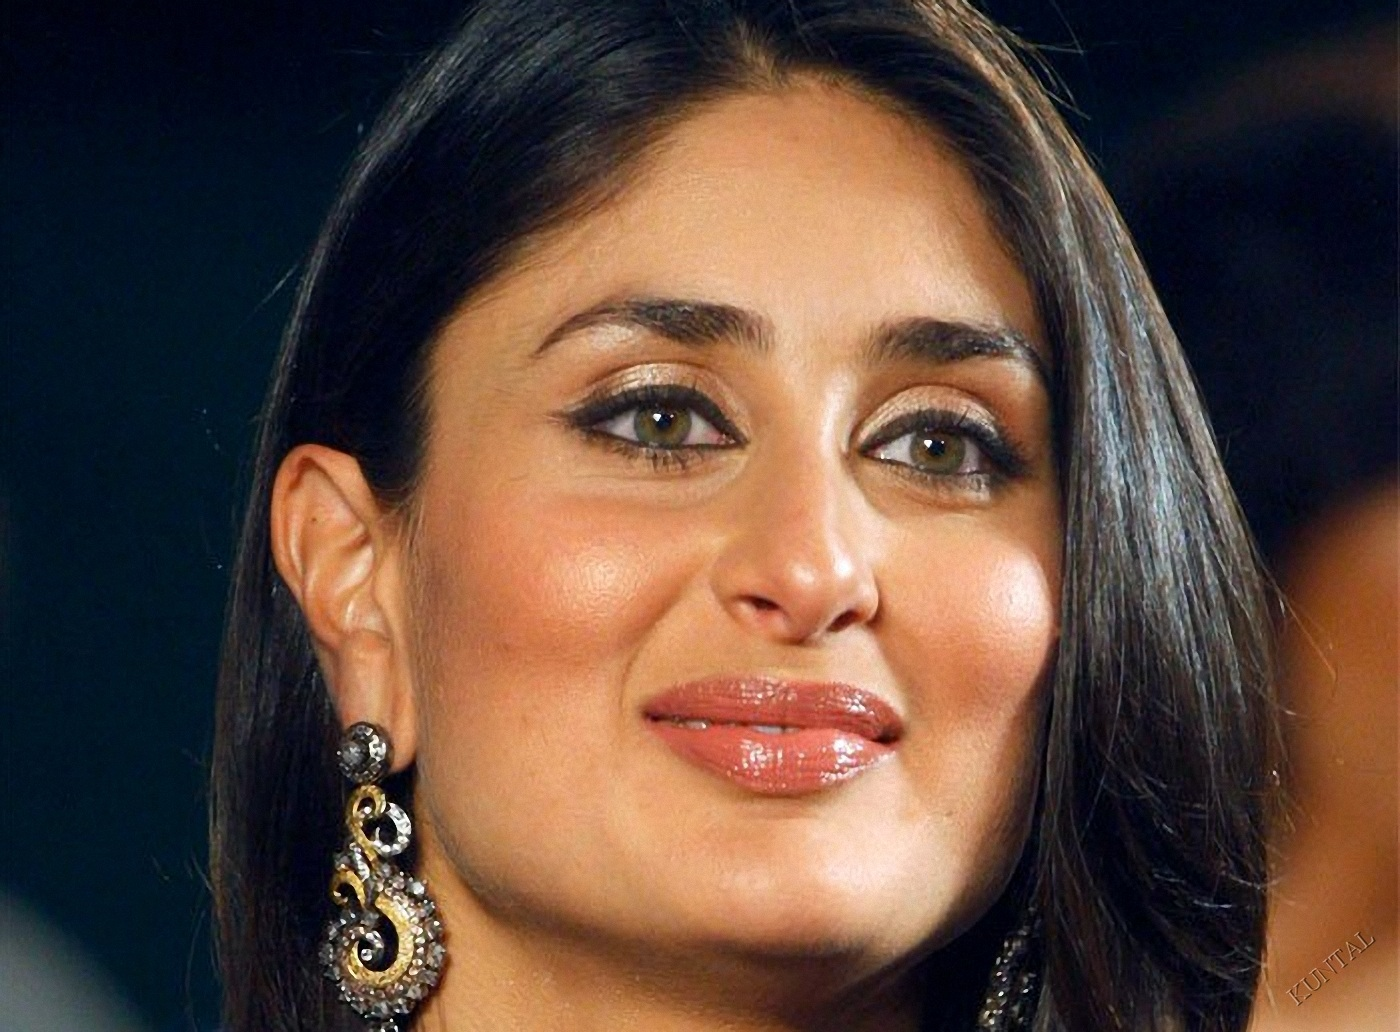 Hd Wallpapers Download All Hd Photos Of Kareena Kapoor-4817